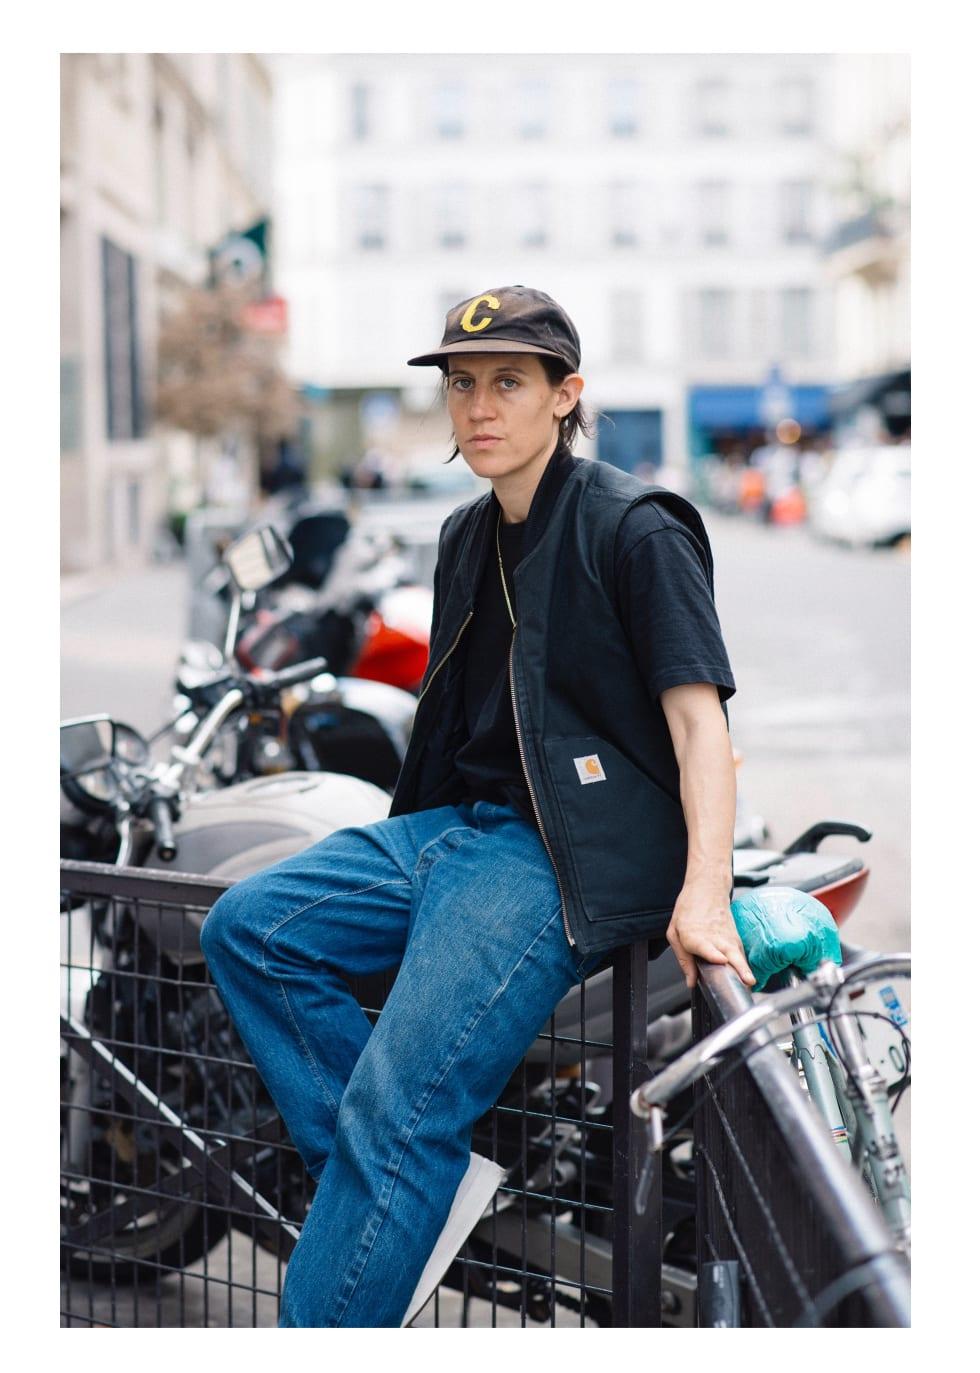 Alexis Sablone, Paris June 2019 for Parade (4)